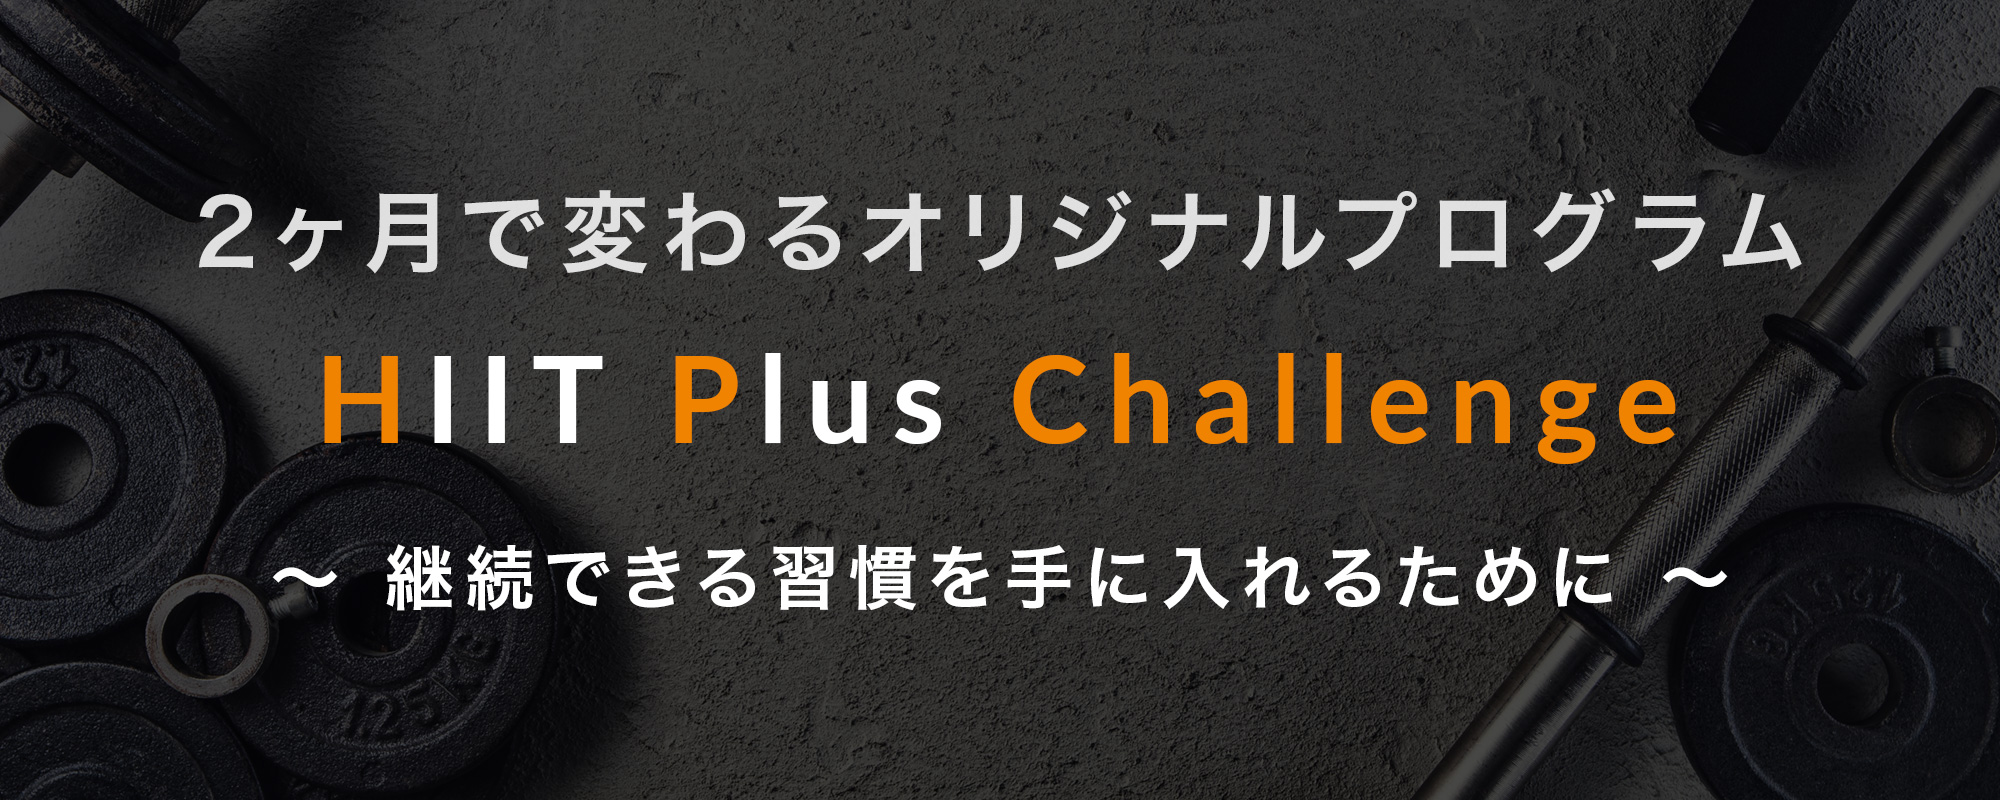 HIIT Plus Challenge